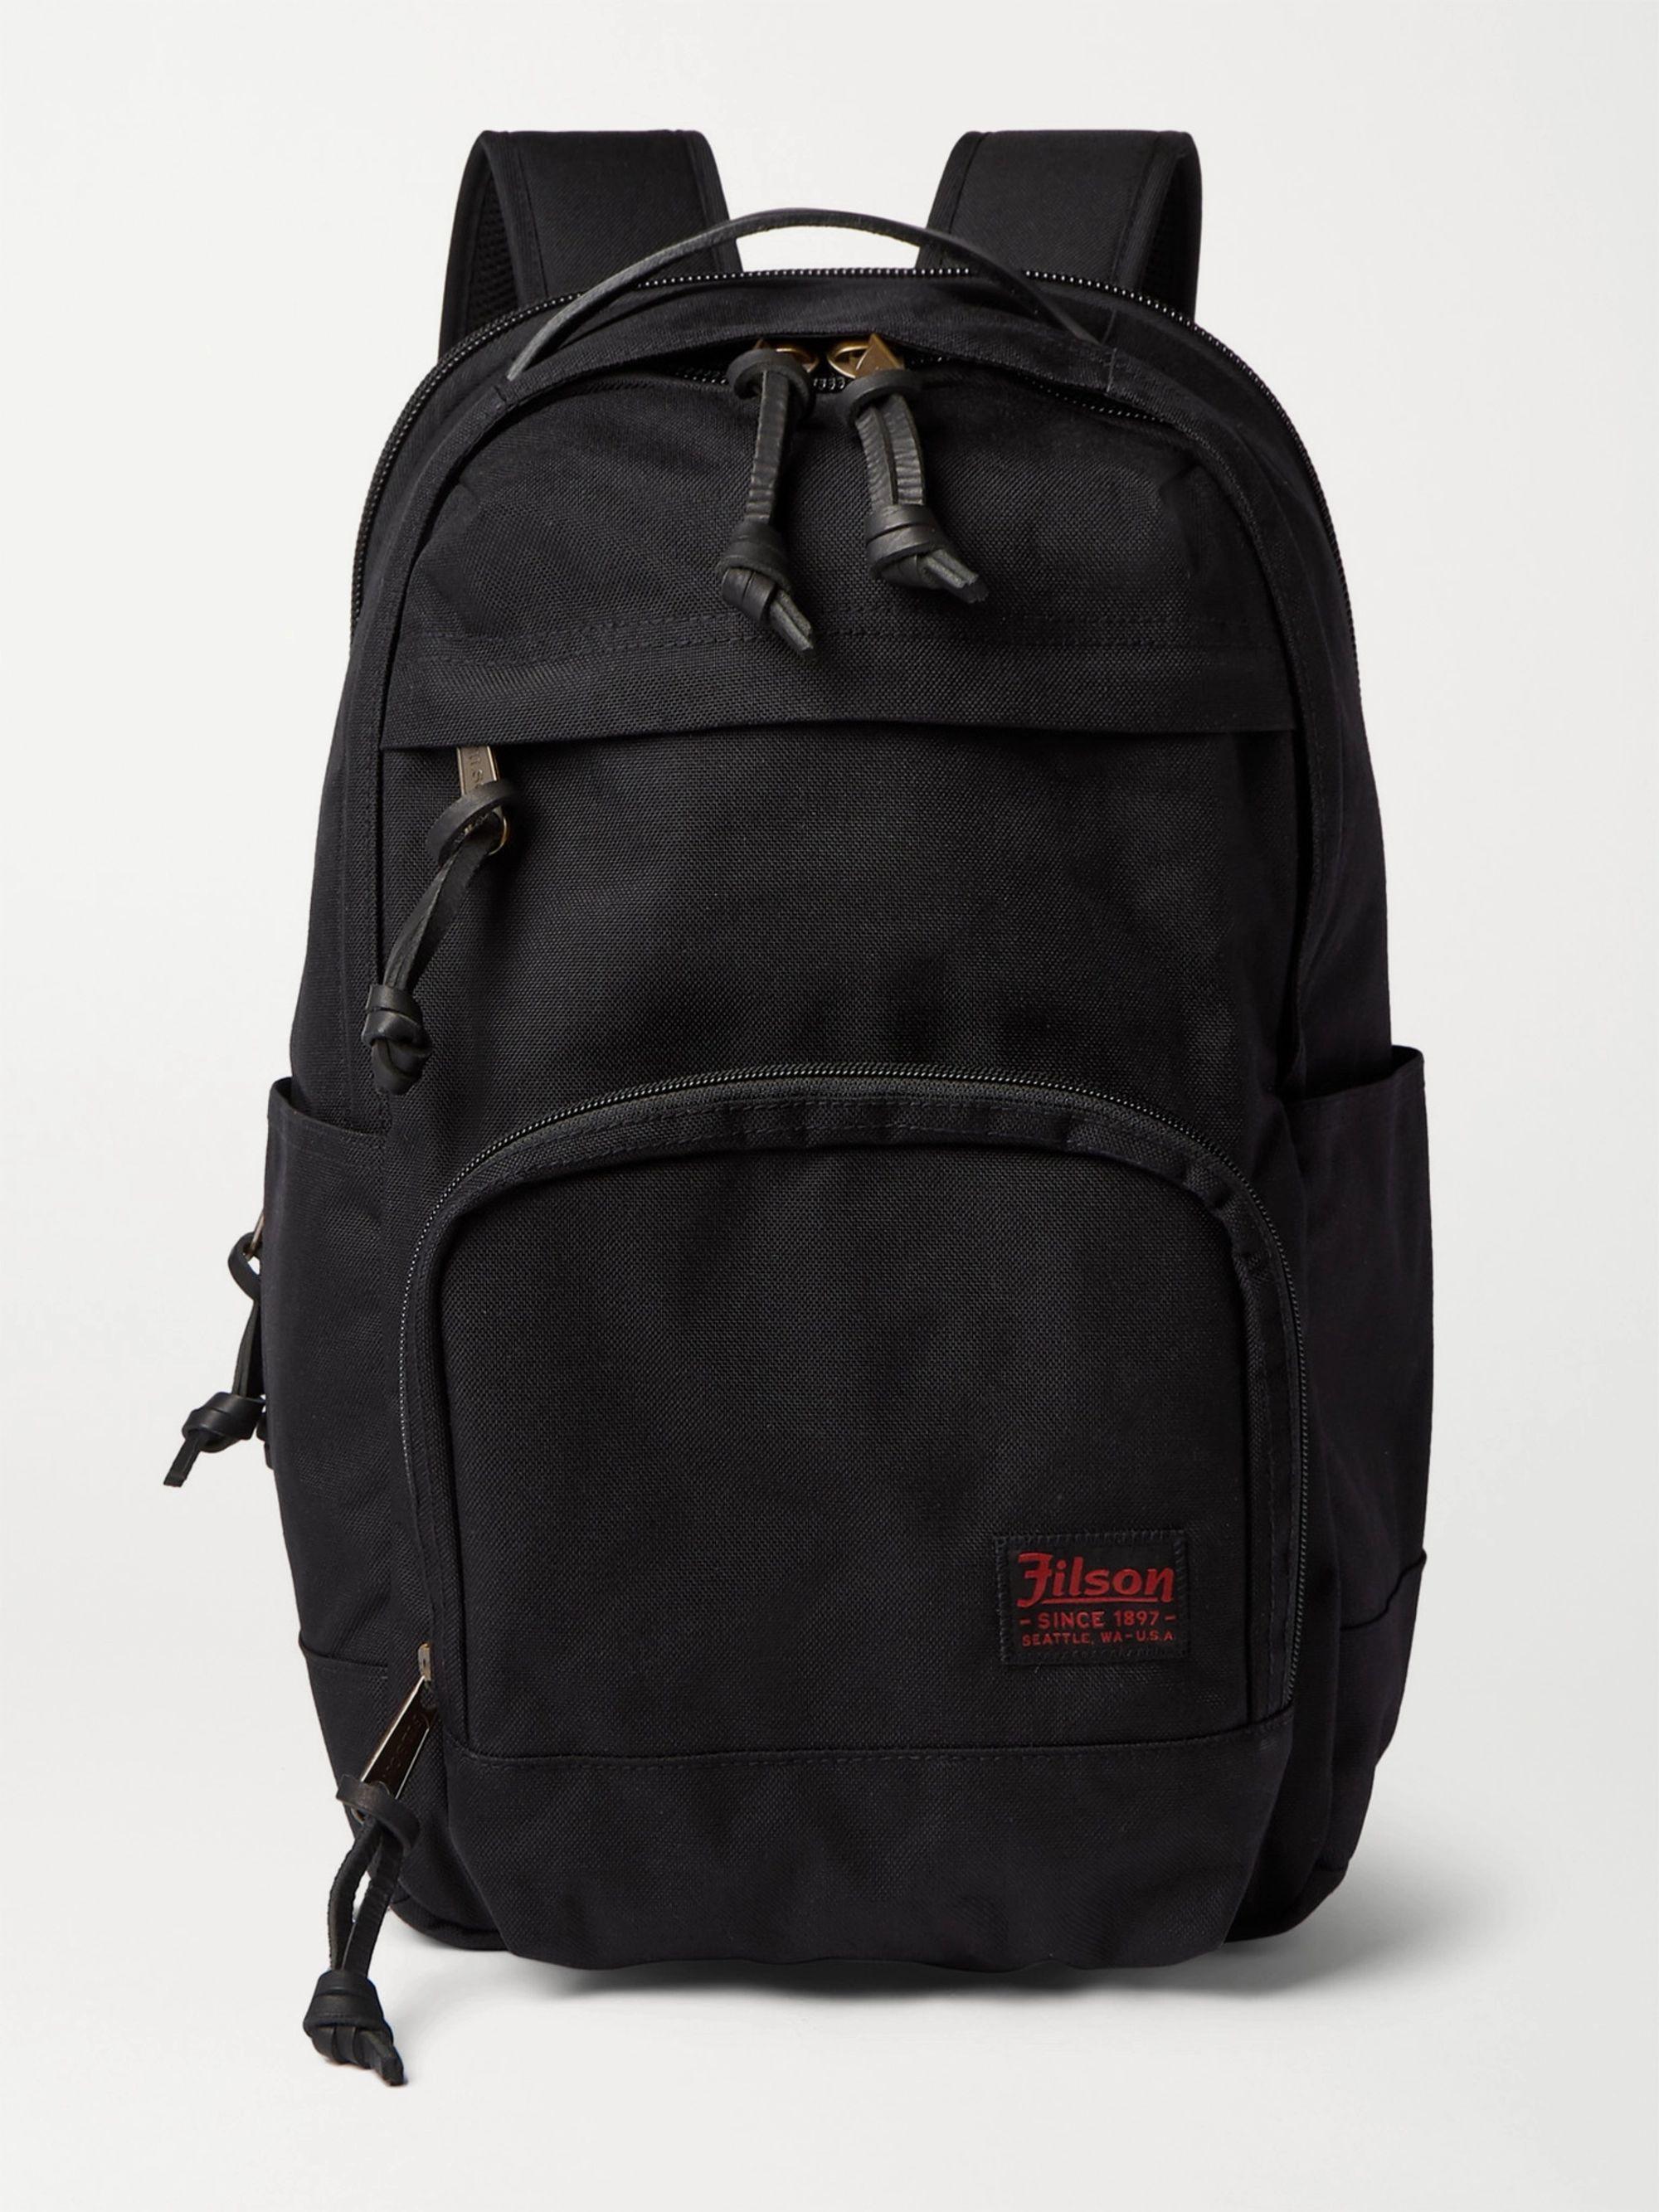 FILSON Dryden Leather-Trimmed CORDURA Backpack,Navy